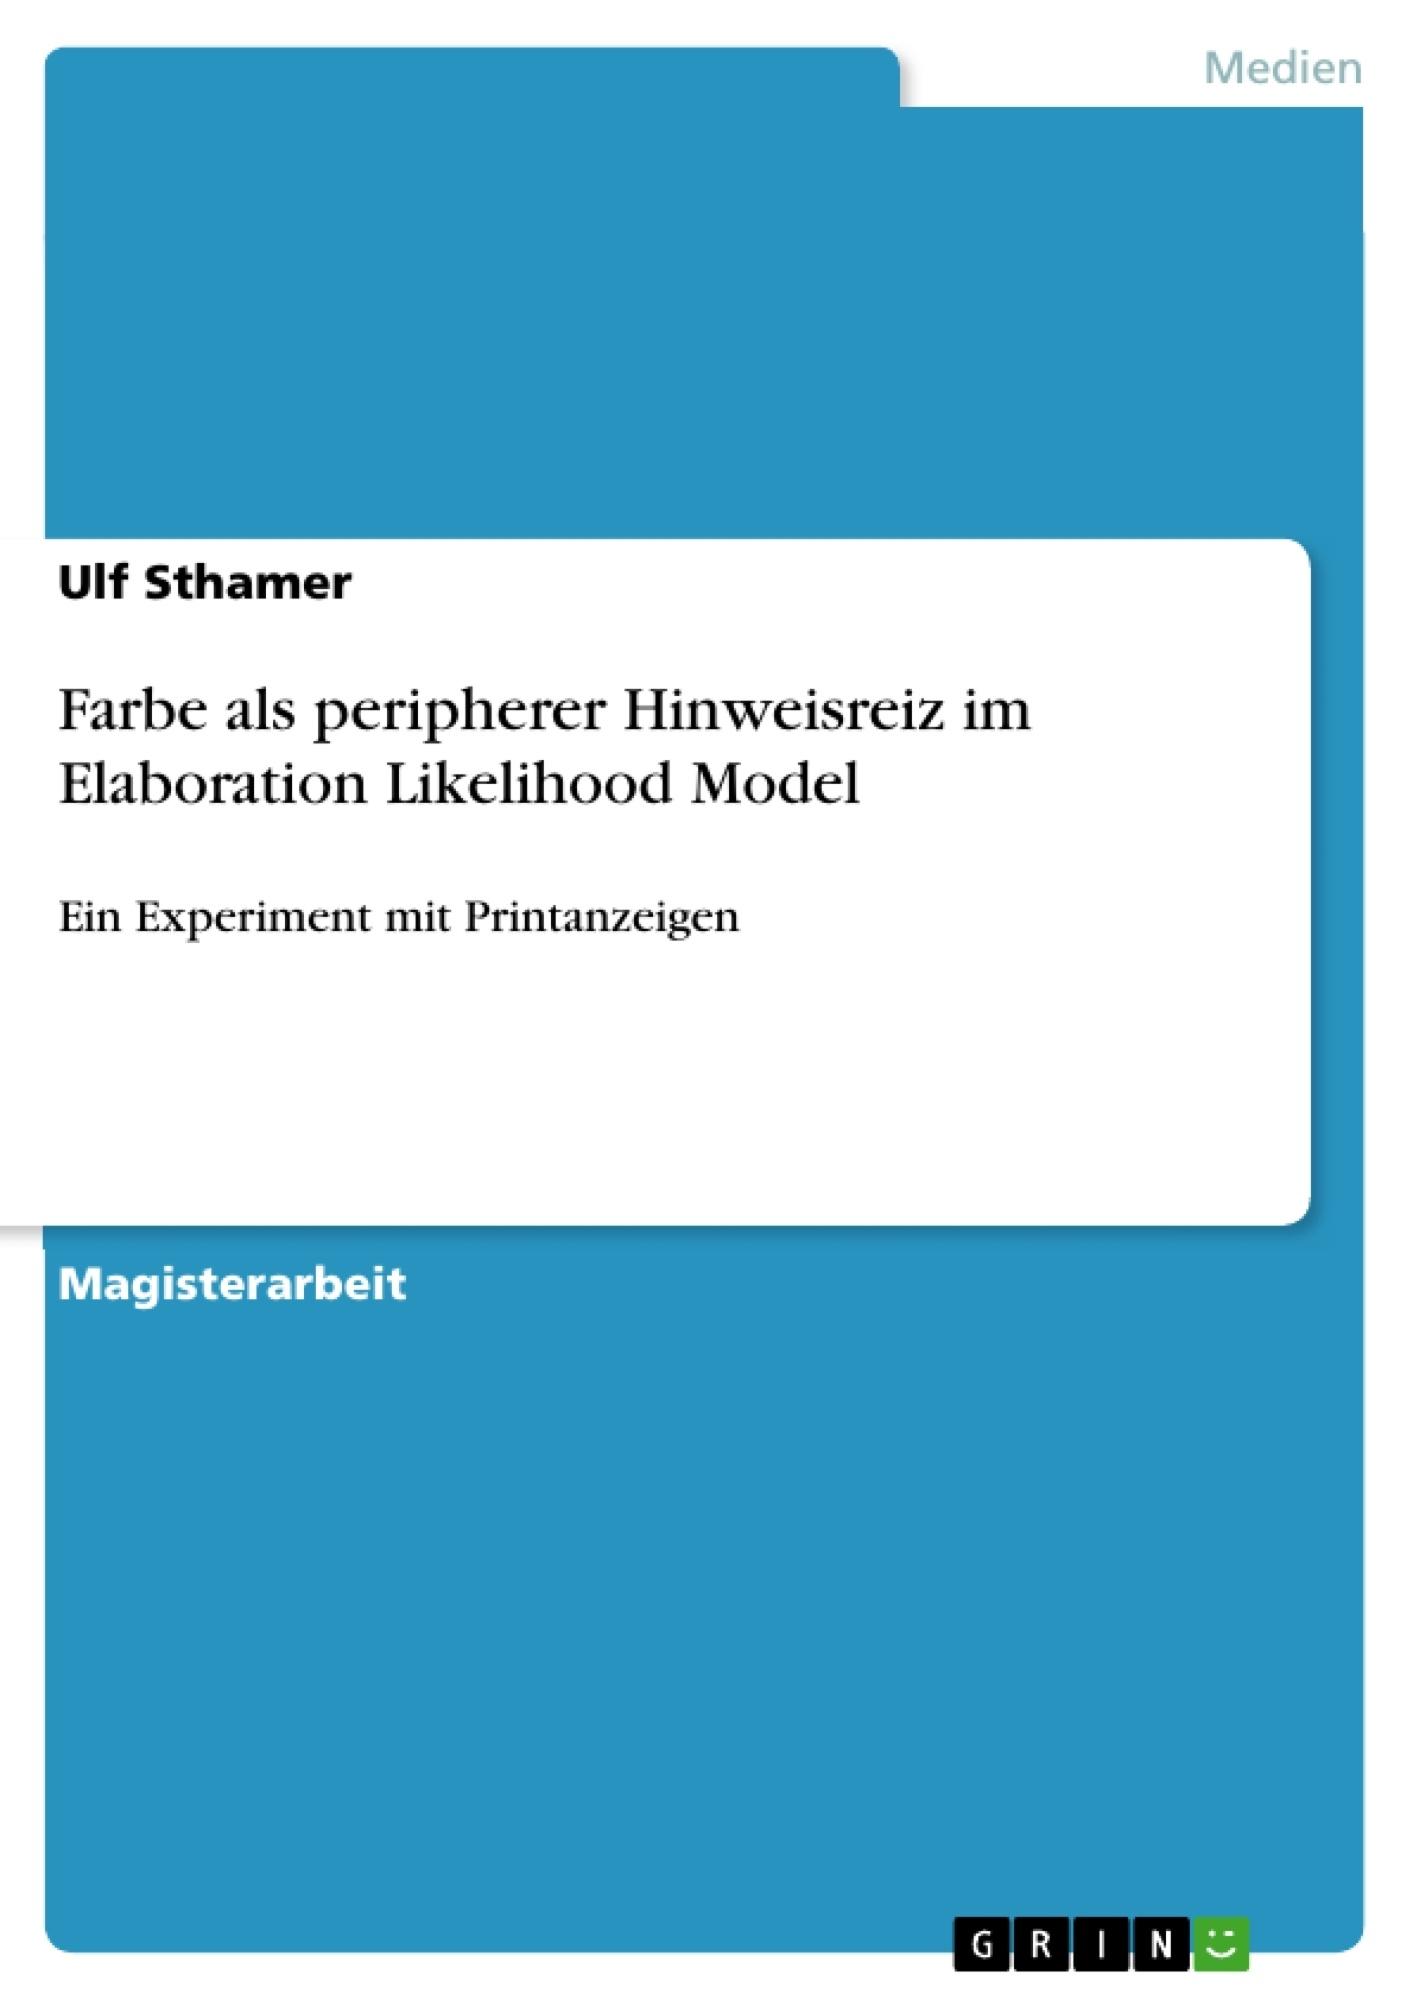 Titel: Farbe als peripherer Hinweisreiz im Elaboration Likelihood Model